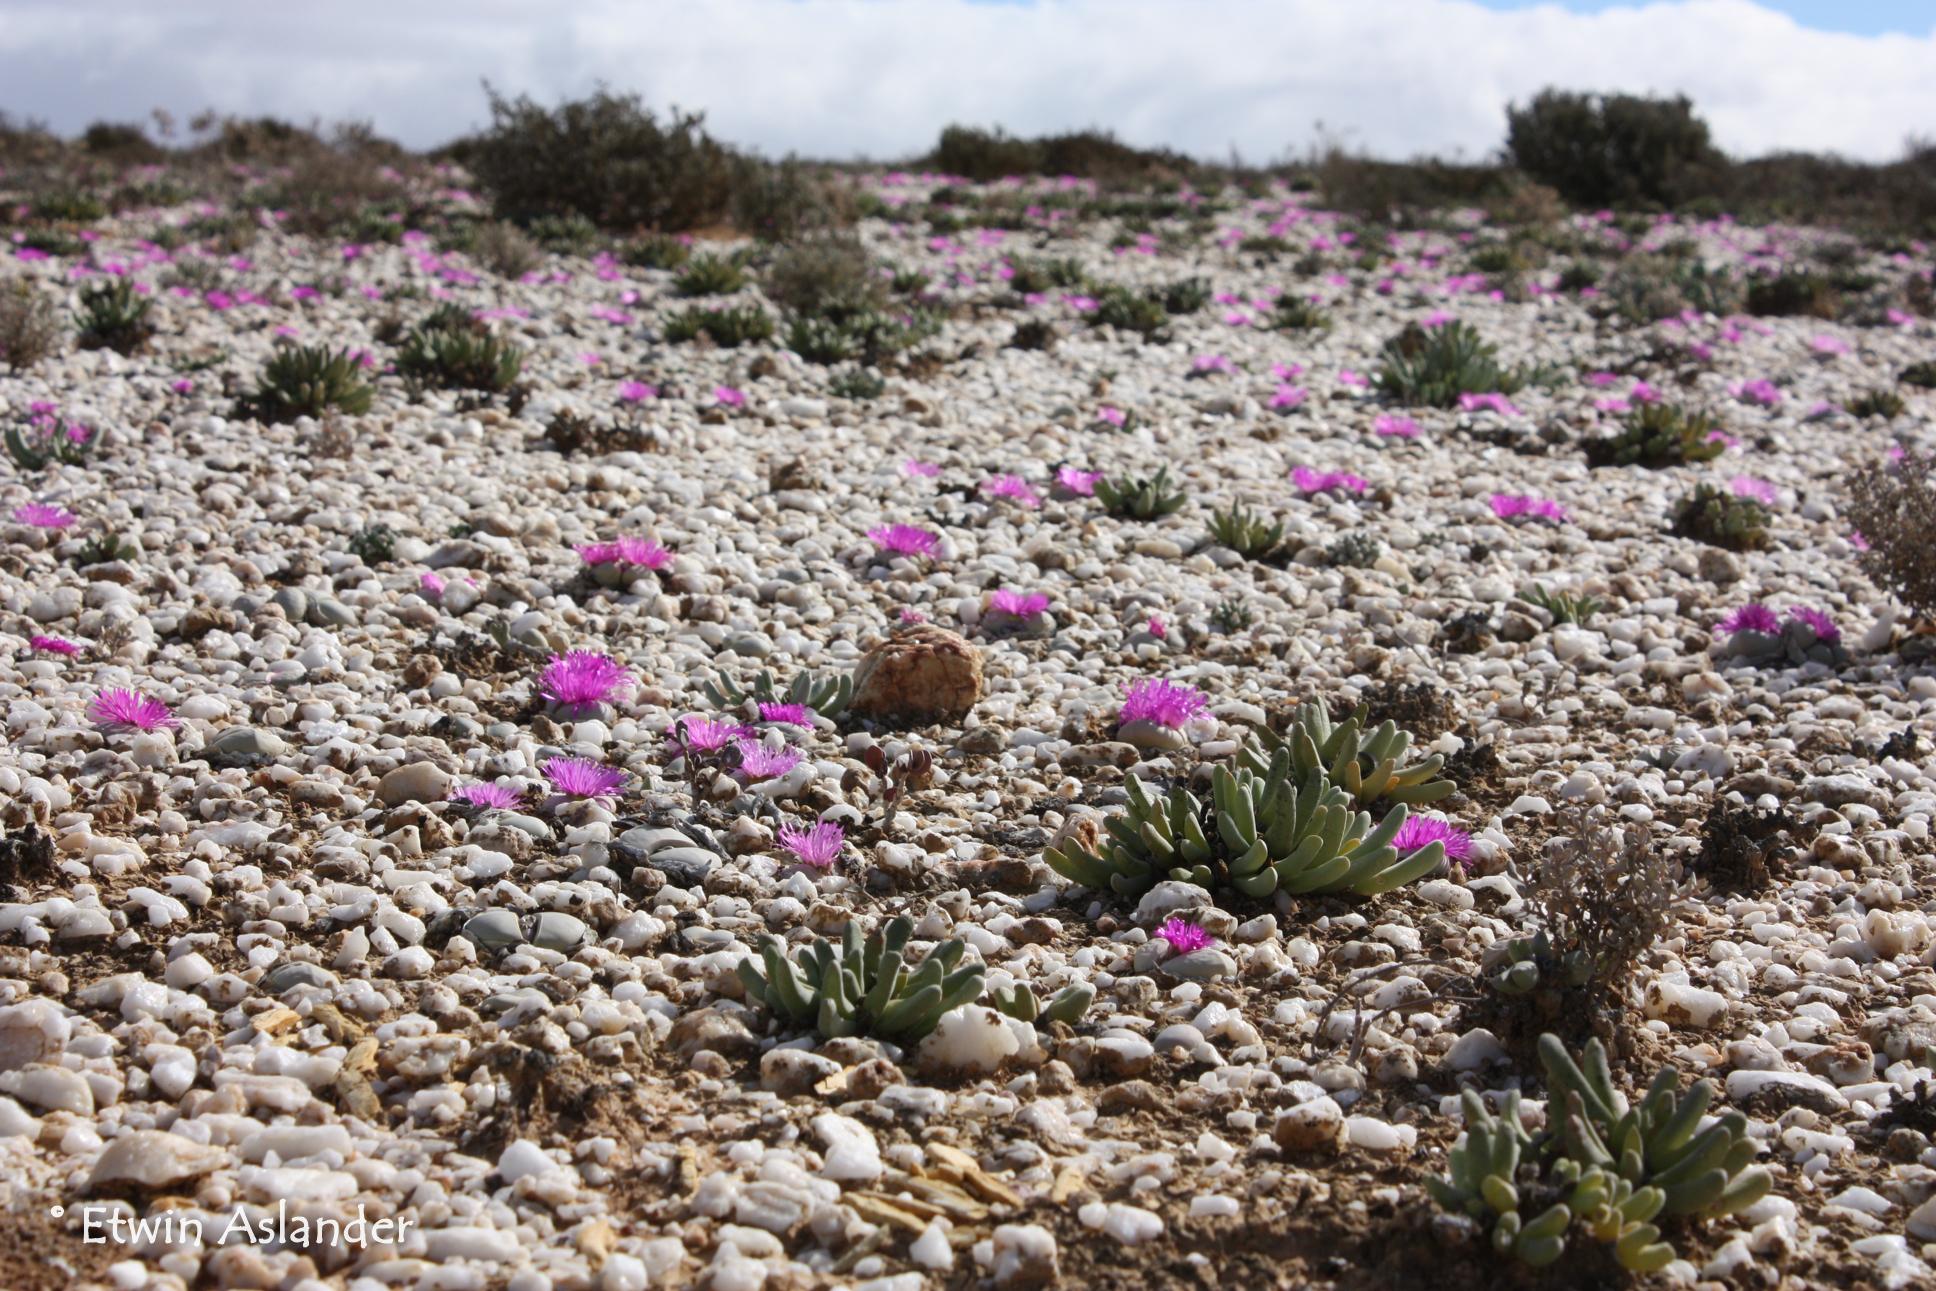 Habitat overview, Argyroderma